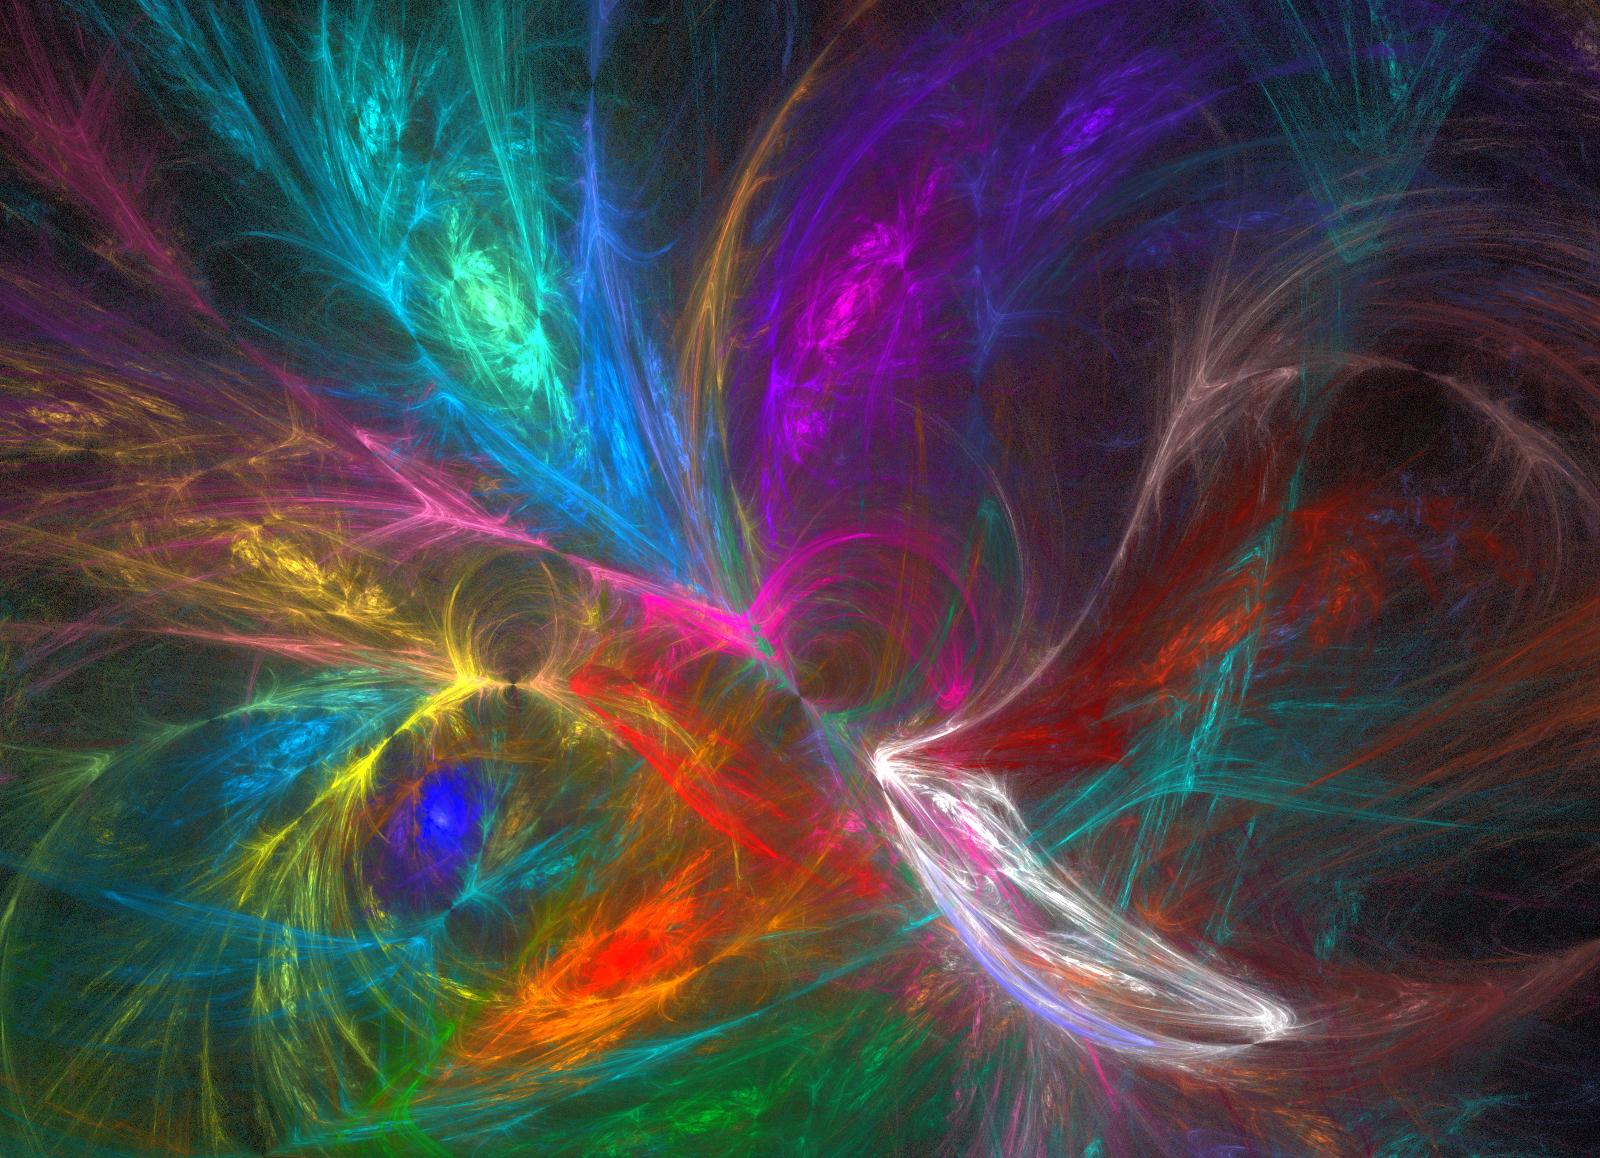 Color explosion wallpaper wallpapersafari - Explosion wallpaper ...